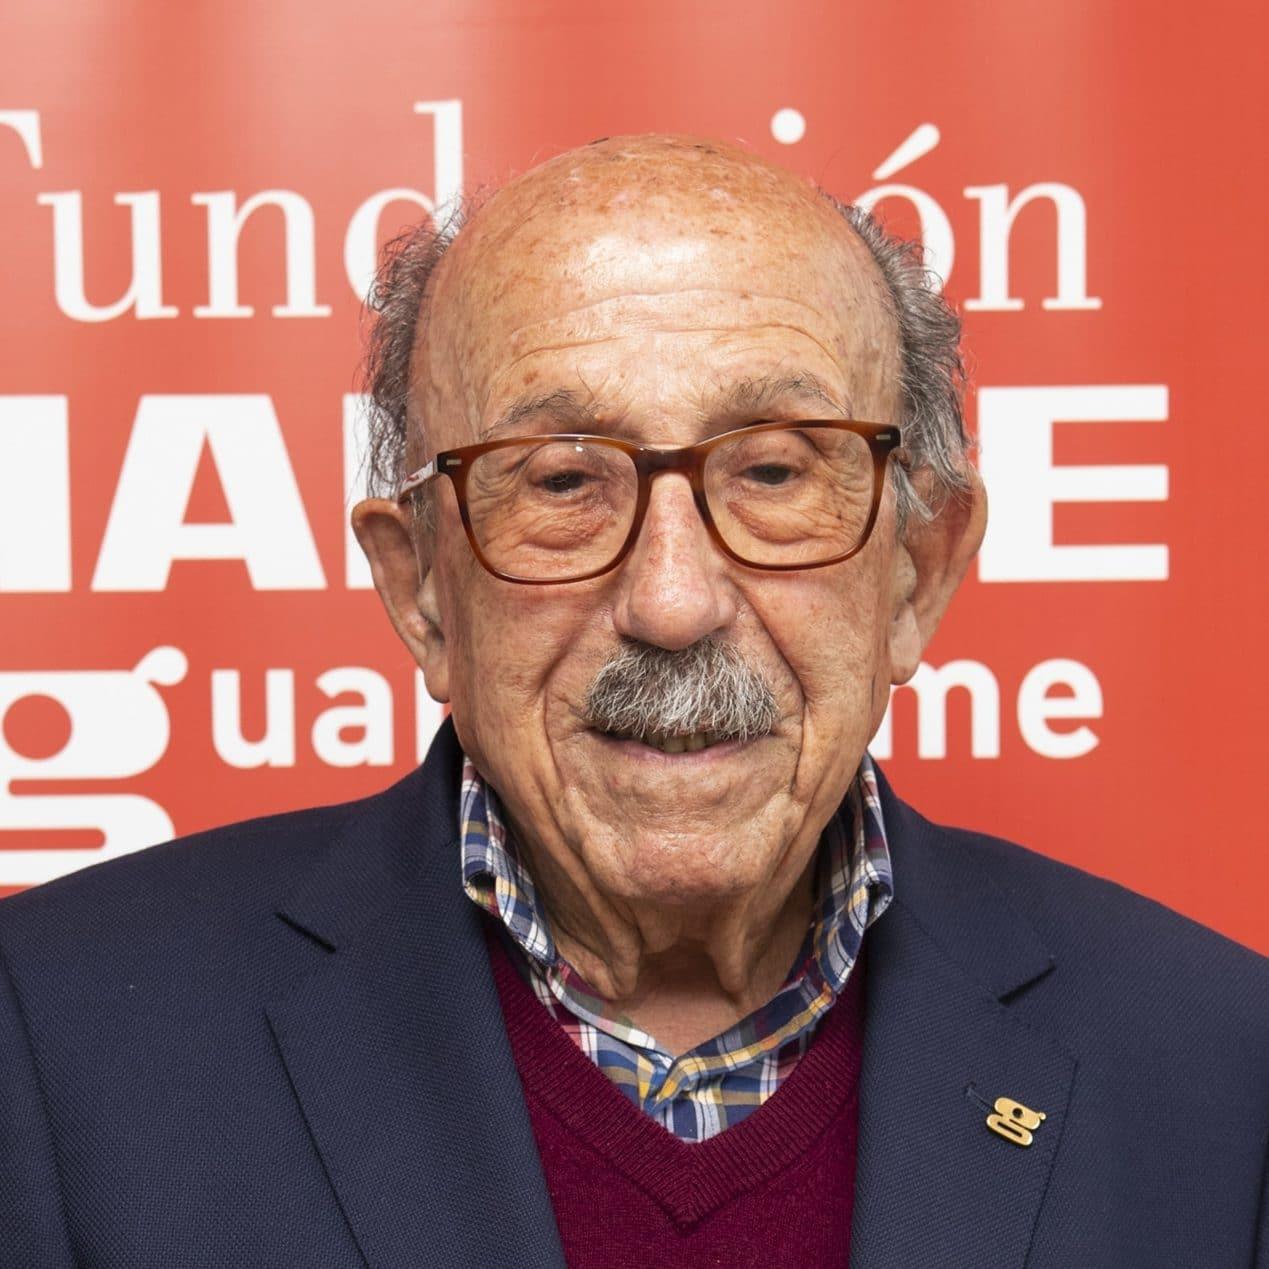 Santiago Rodríguez Santana